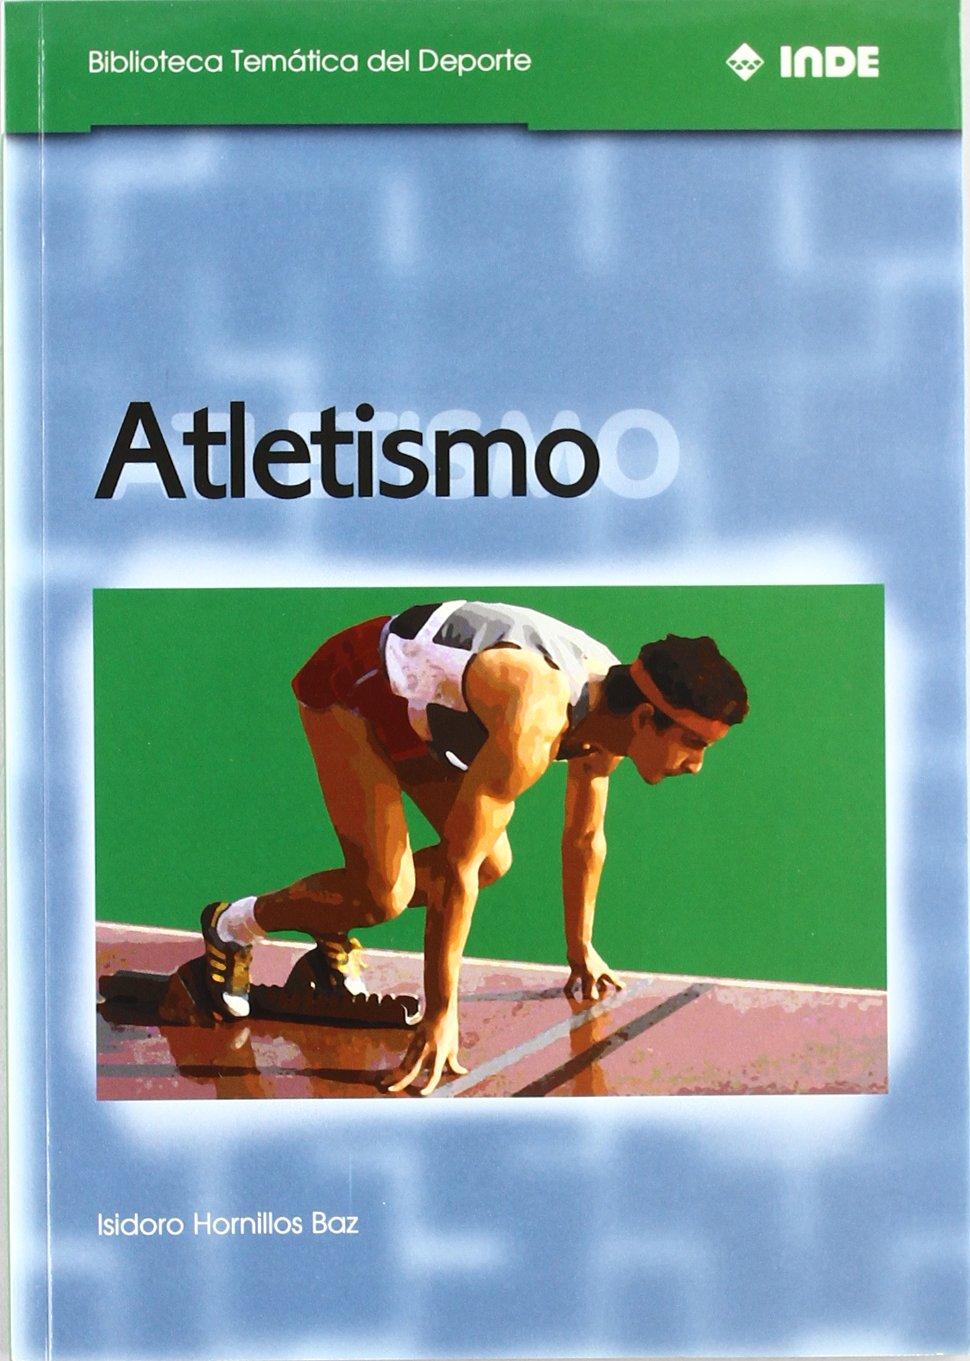 Atletismo (Spanish Edition): Isidoro Hornillos Baz: 9788495114211: Amazon.com: Books